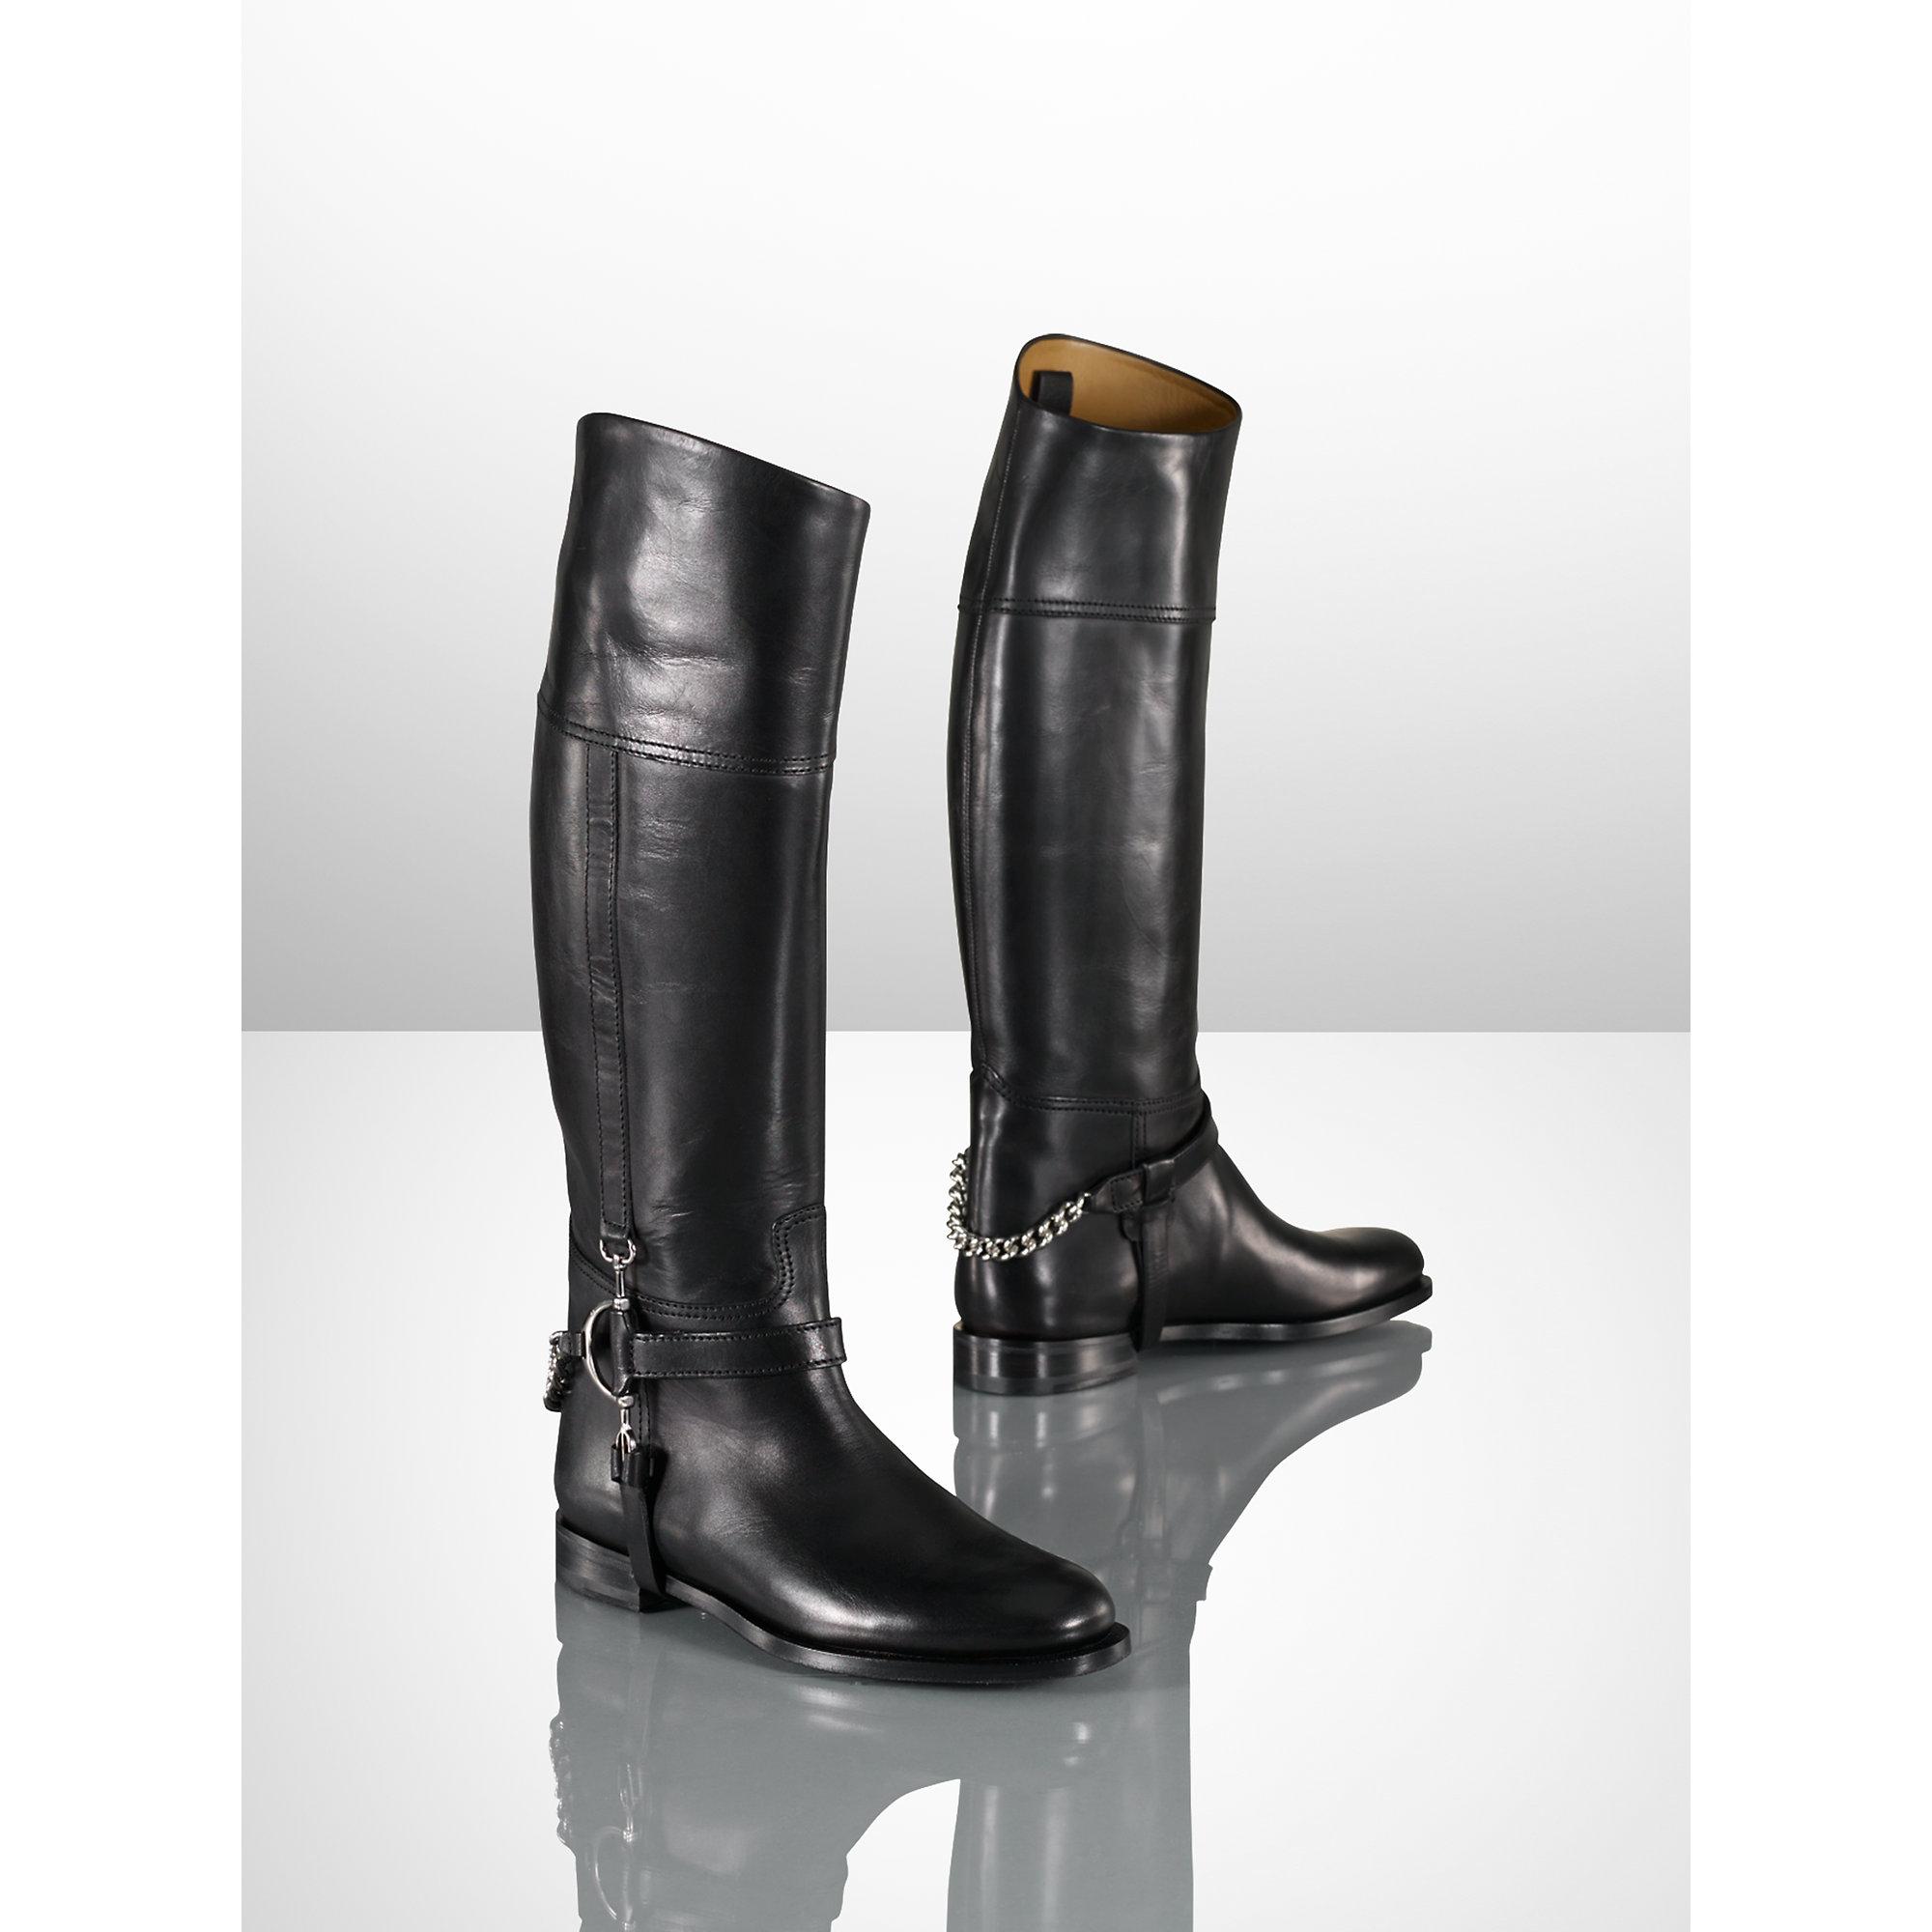 Ralph lauren Calf Chain Sandra Riding Boot in Brown (tan